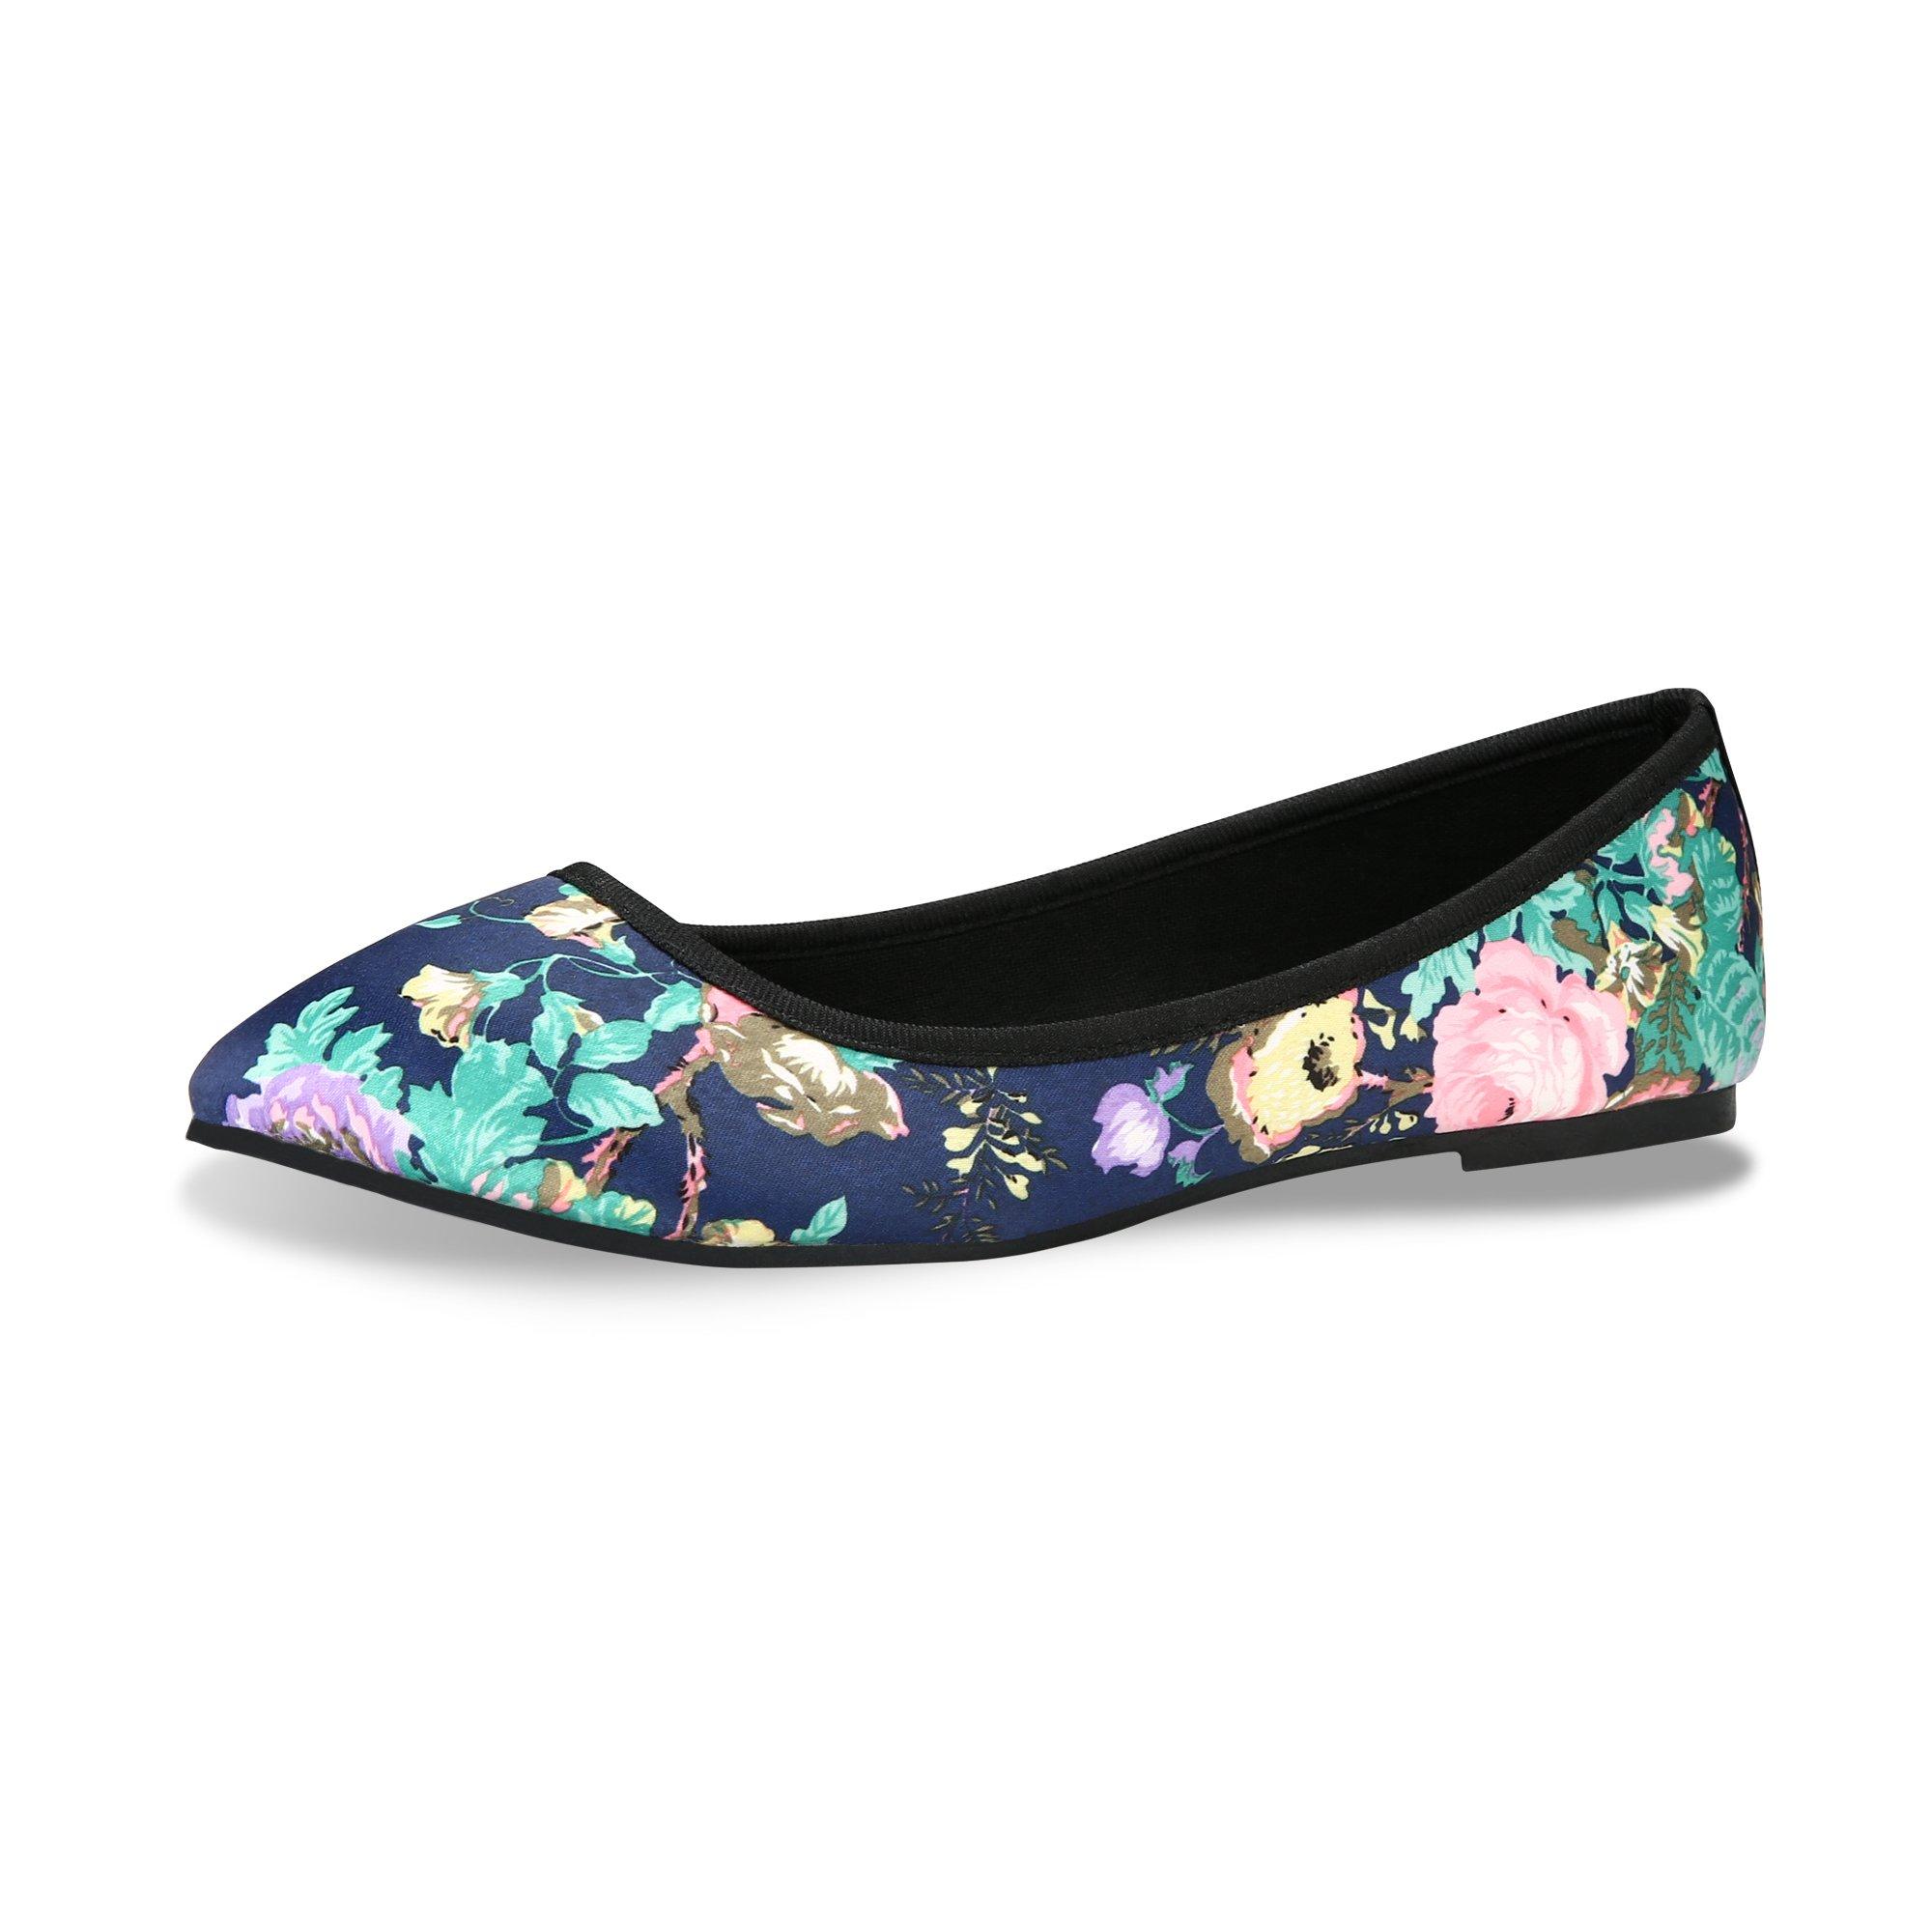 CINAK Flat Shoes Women Floral Printing Low-Cut Pointed Toe (8-8.5 B(M) US/EU39/CN40/25CM, Blue)